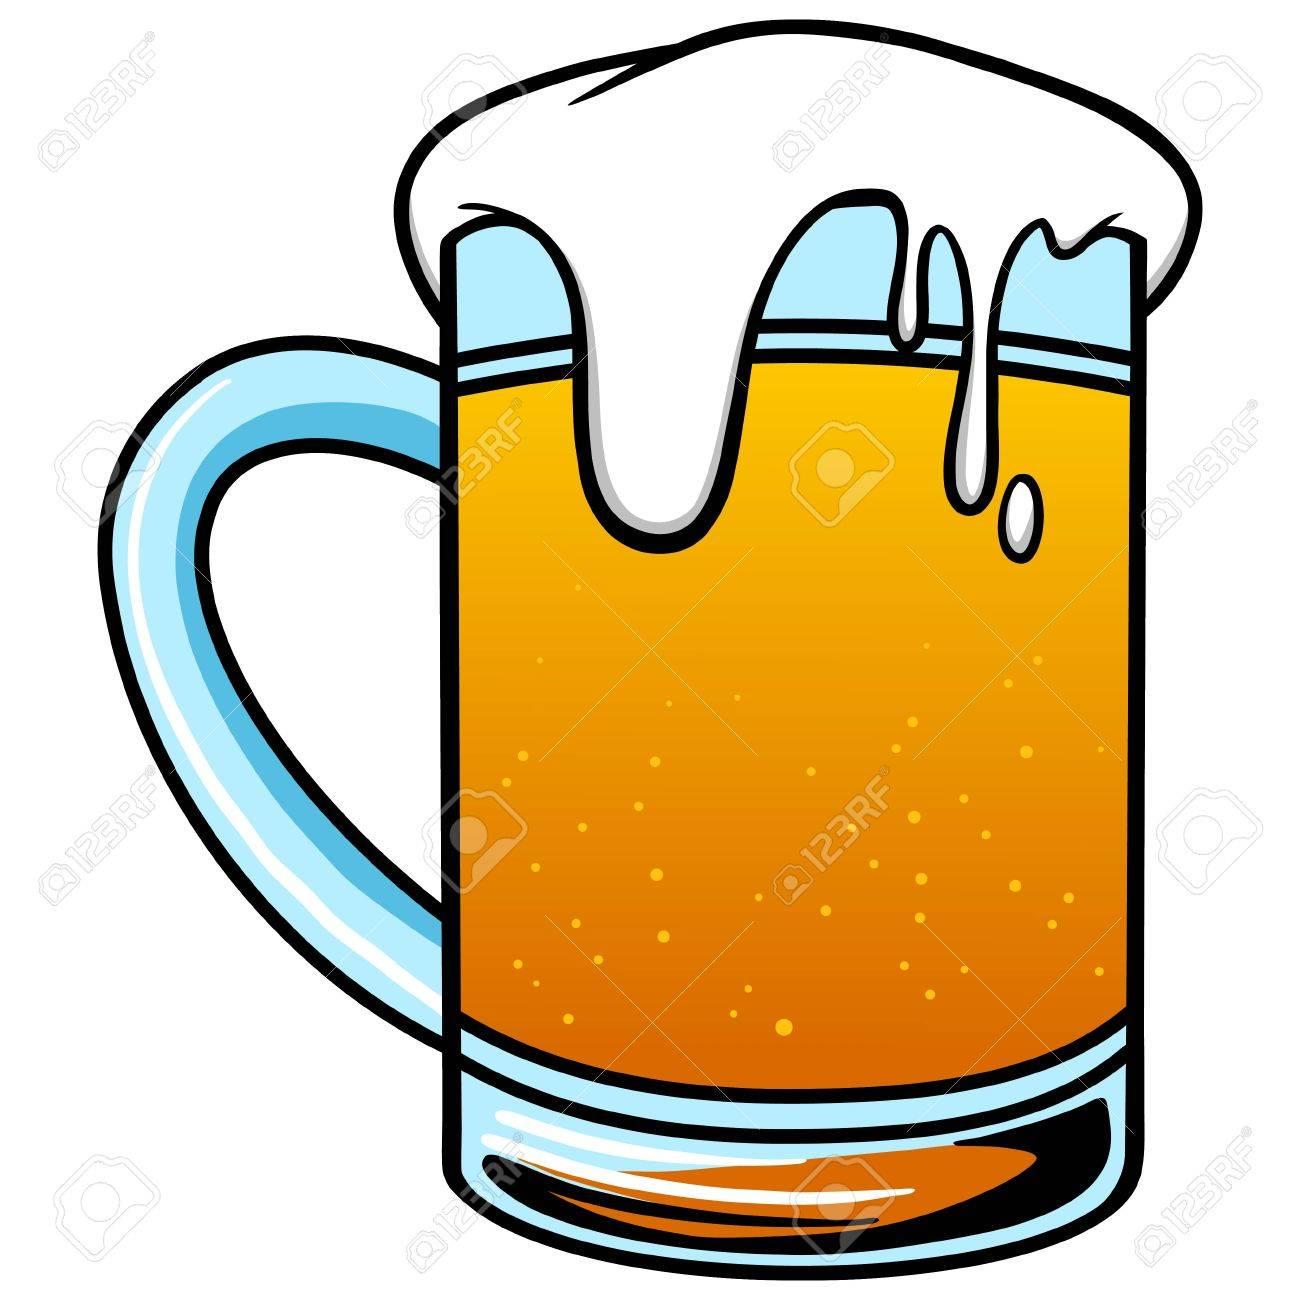 1300x1300 Mug Of Beer Royalty Free Cliparts, Vectors, And Stock Illustration